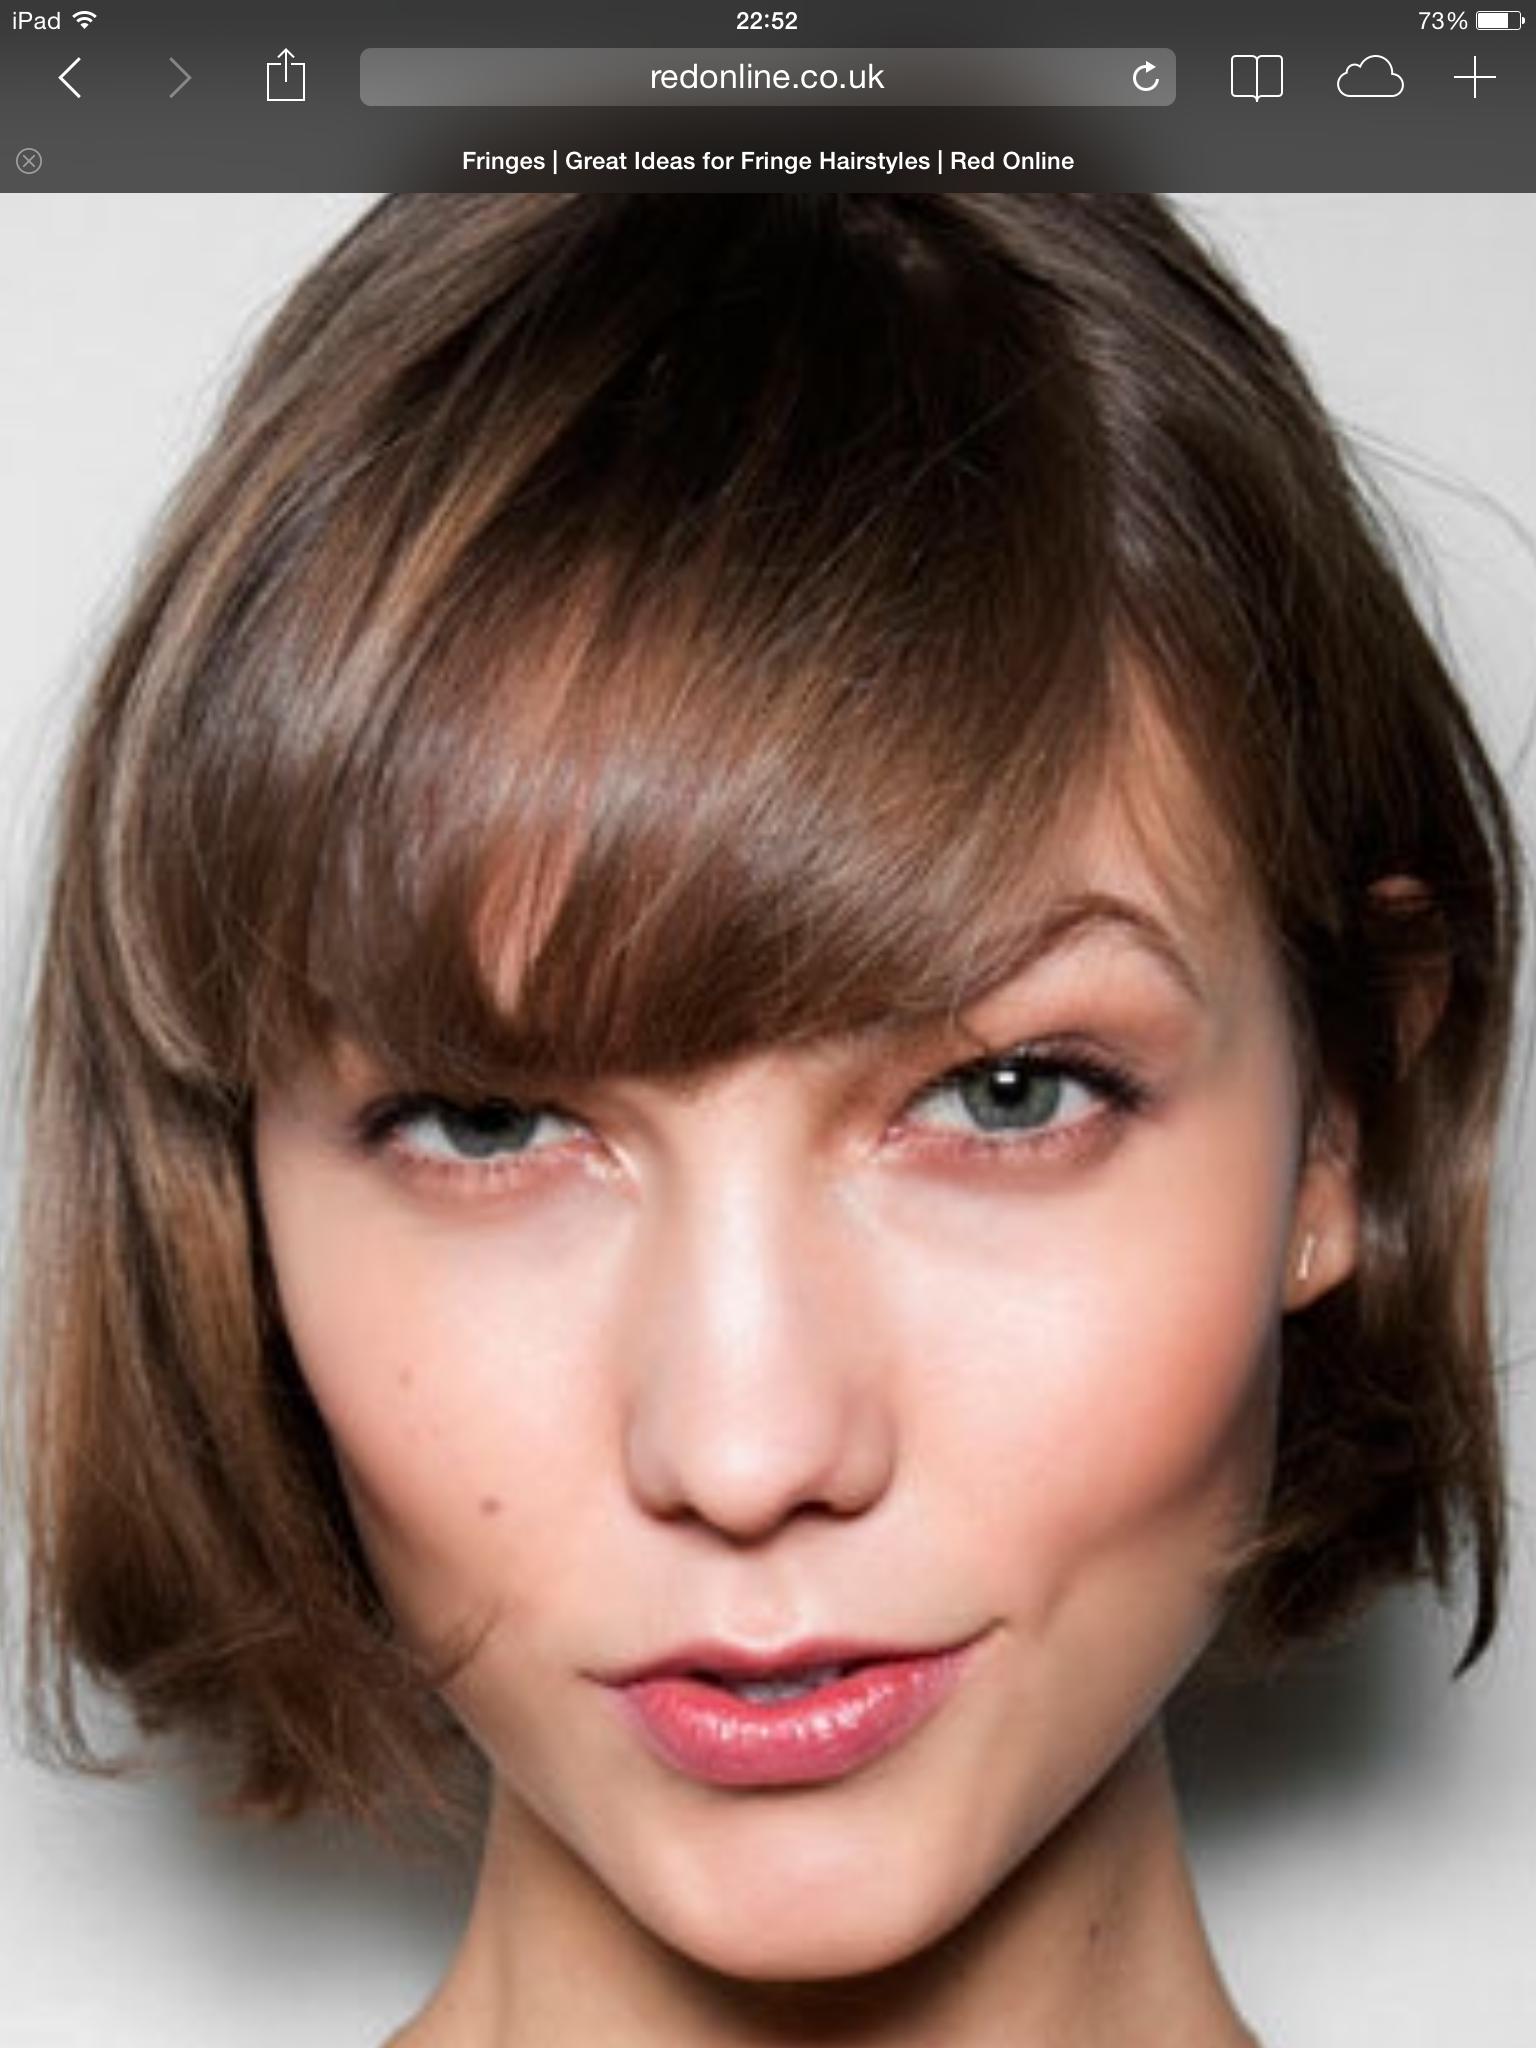 pin by lacy omsberg on cute hair in 2019 | hair cuts, karlie